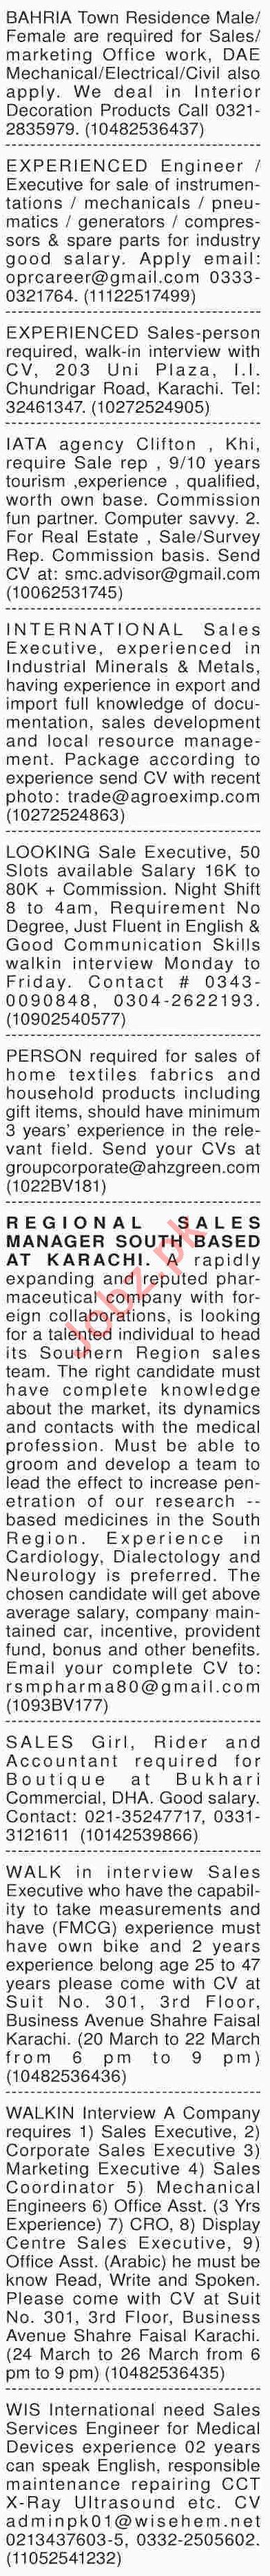 Dawn Sunday Classified Ads 17th March 2019 Sales Staff